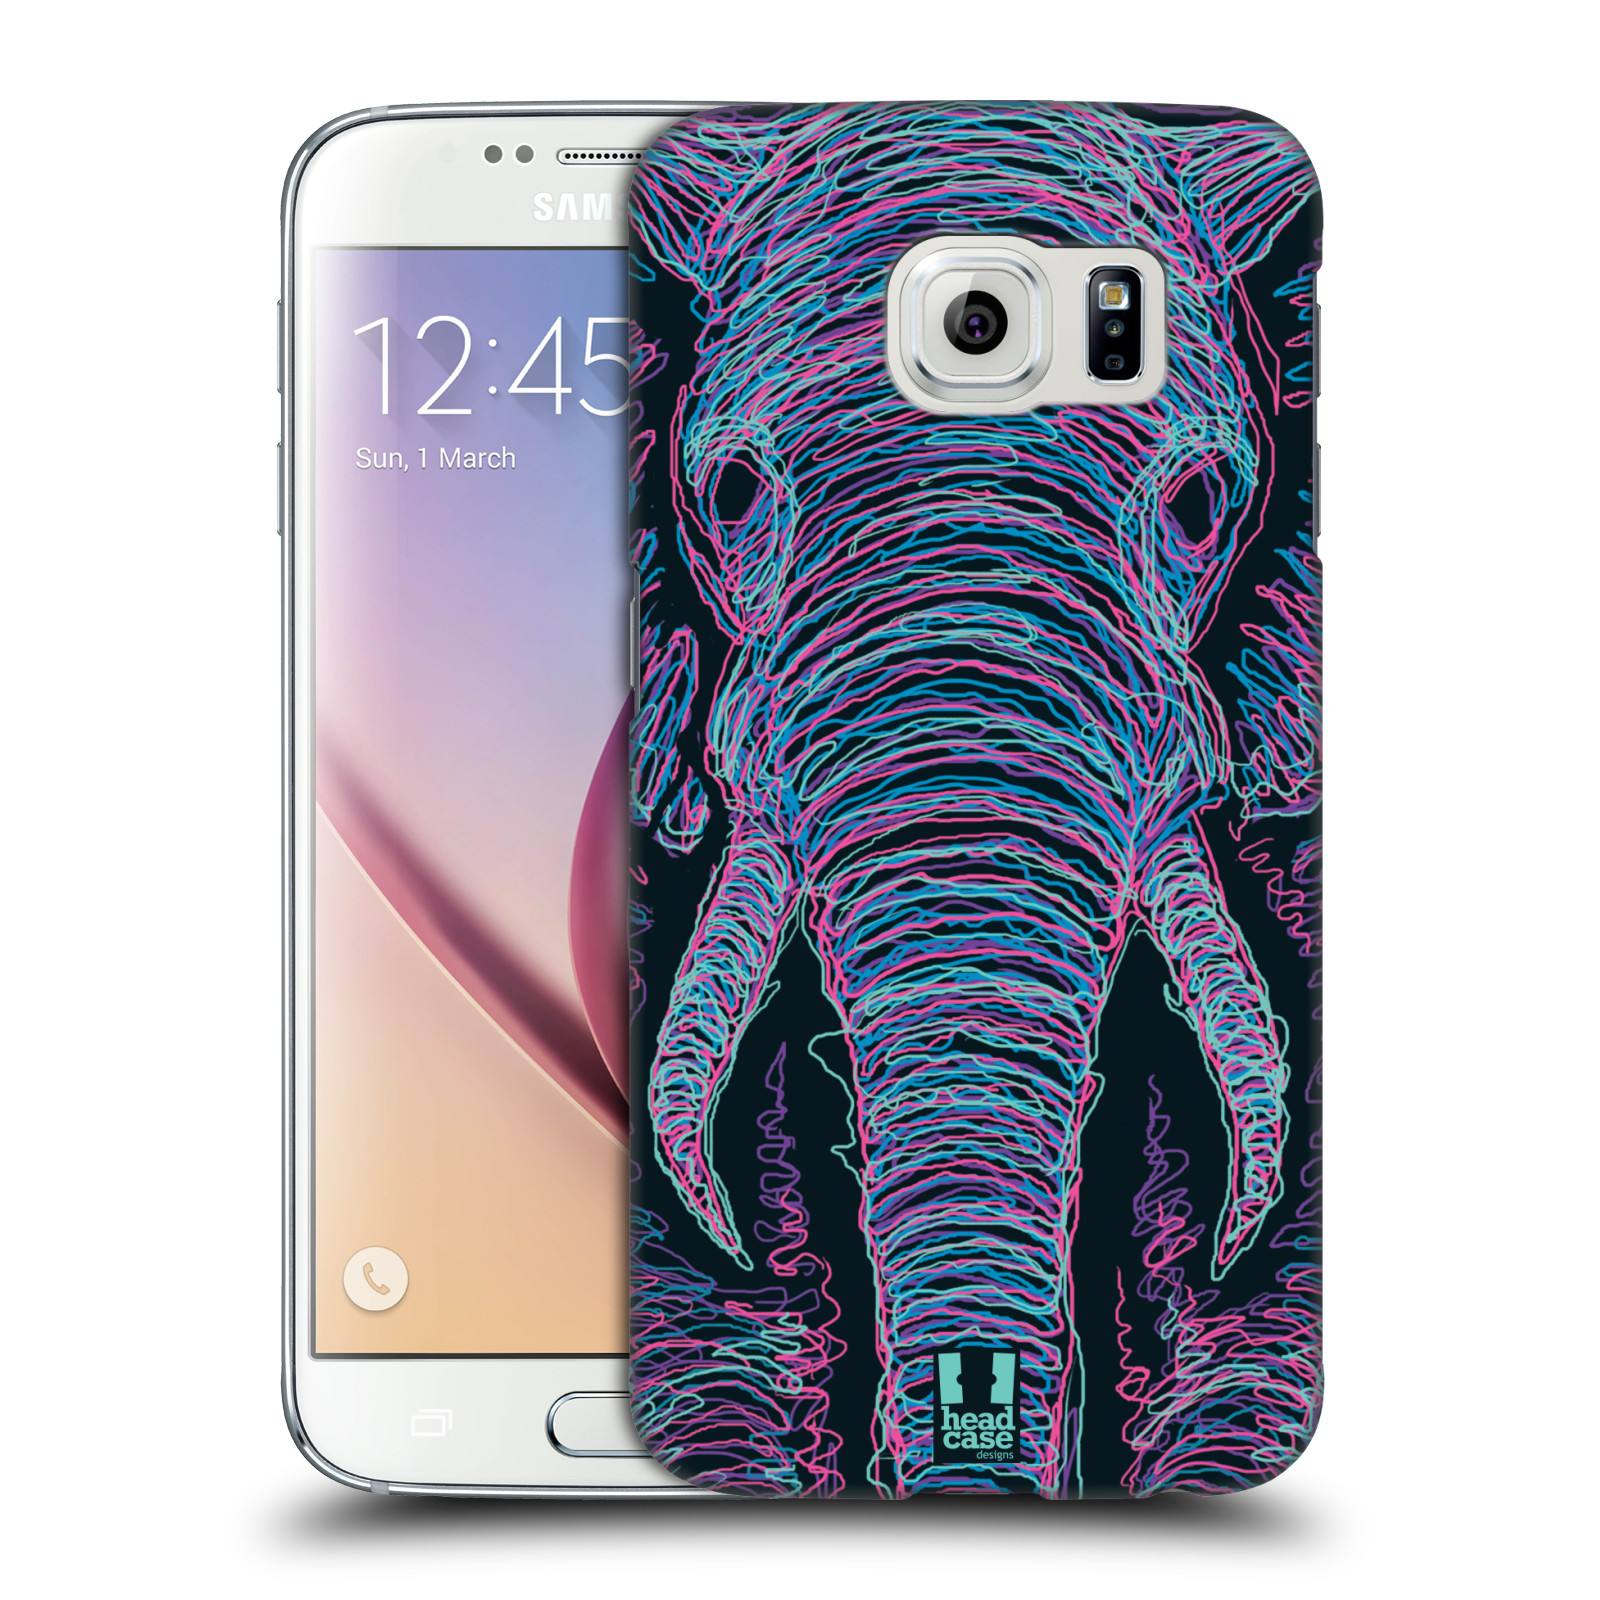 HEAD CASE plastový obal na mobil SAMSUNG Galaxy S6 (G9200, G920F) vzor zvíře čmáranice slon